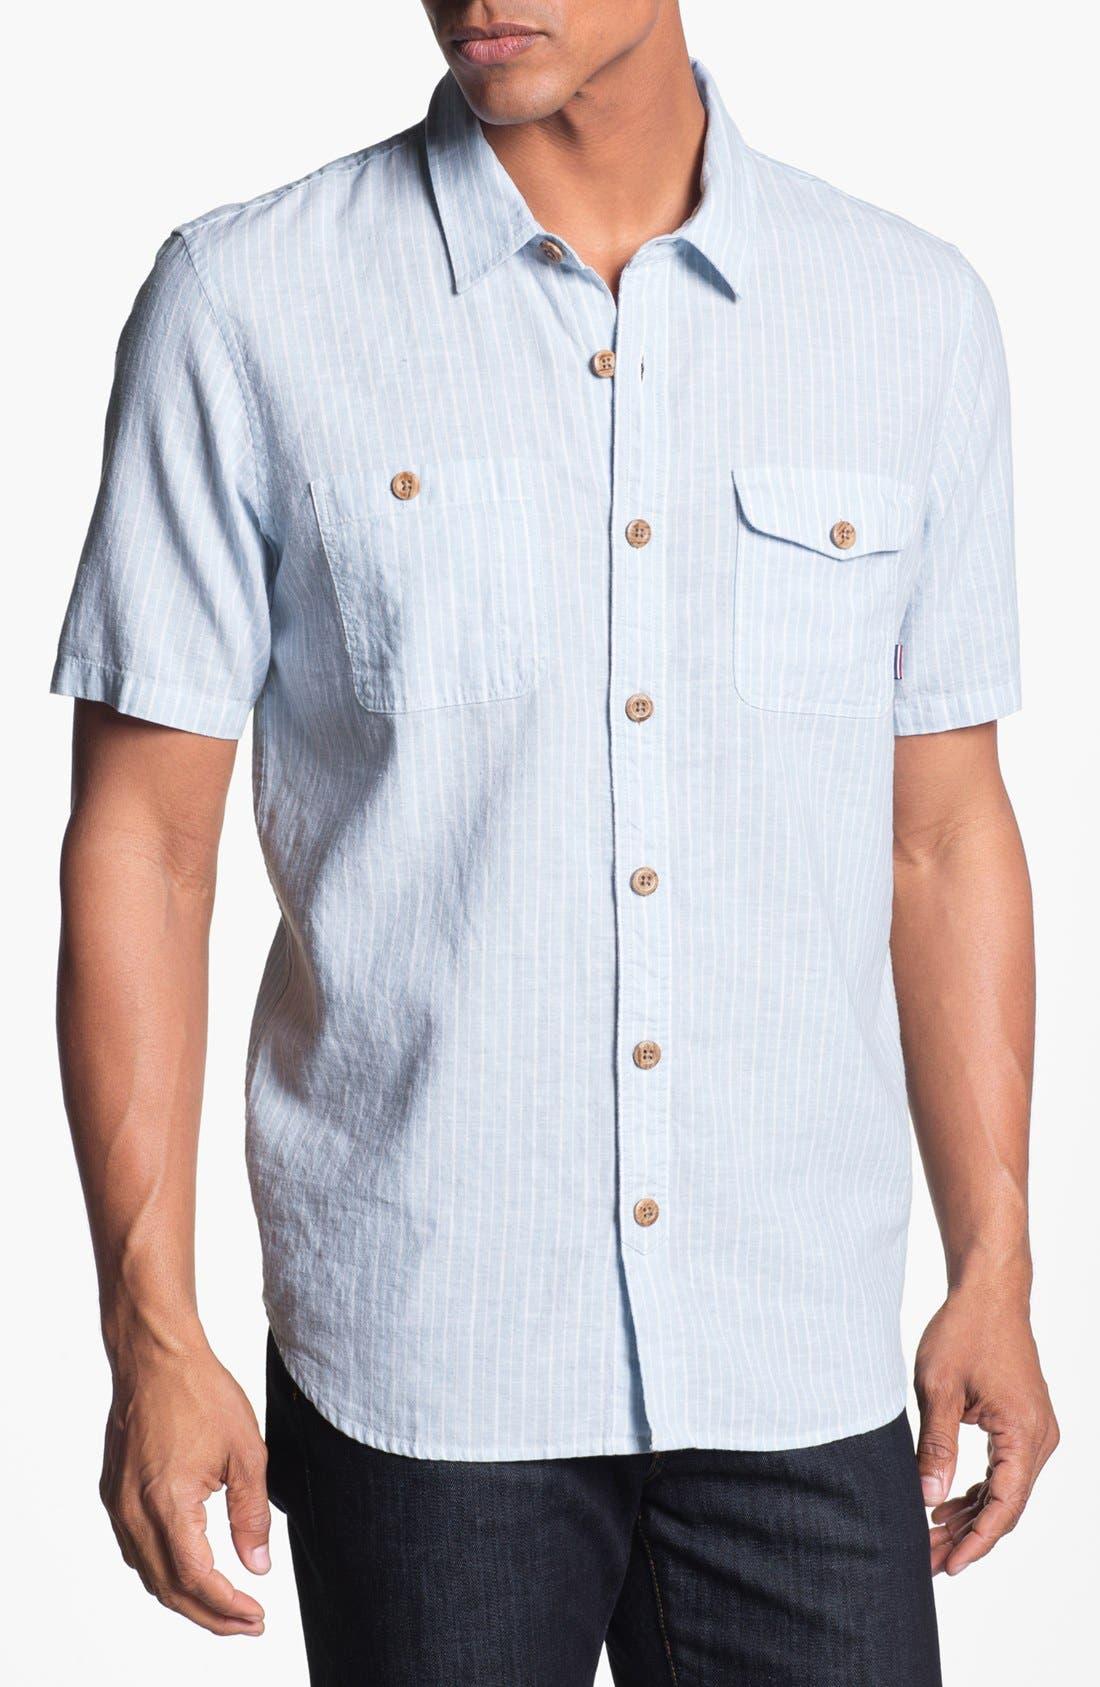 Alternate Image 1 Selected - Jack O'Neill 'August' Short Sleeve Sport Shirt